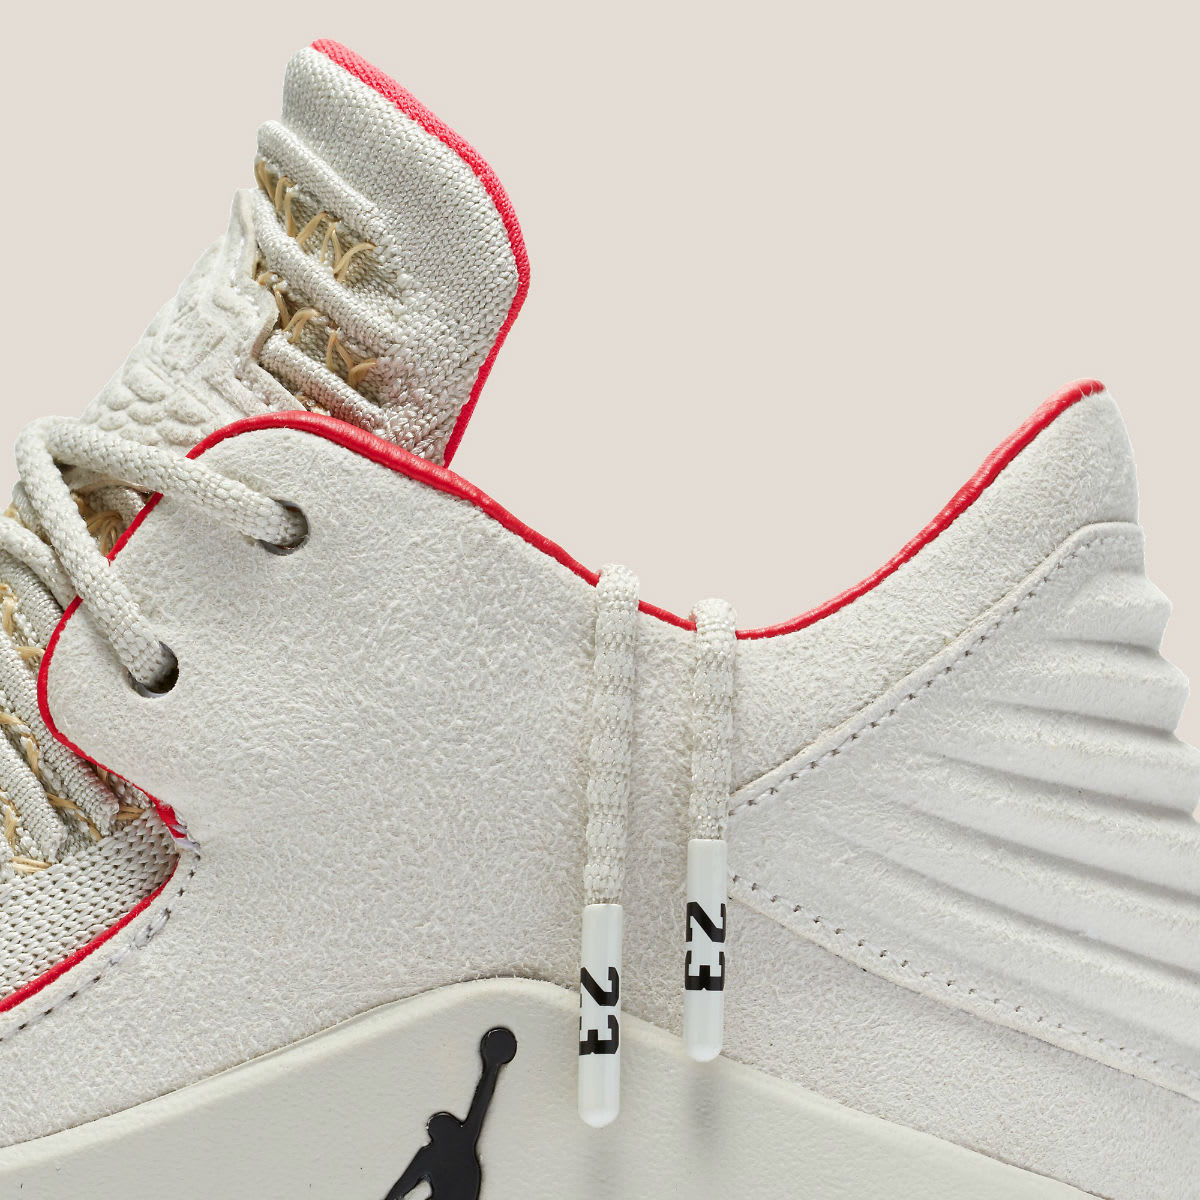 Air Jordan 32 Low Gordon Street Release Date AA1256-004 Collar